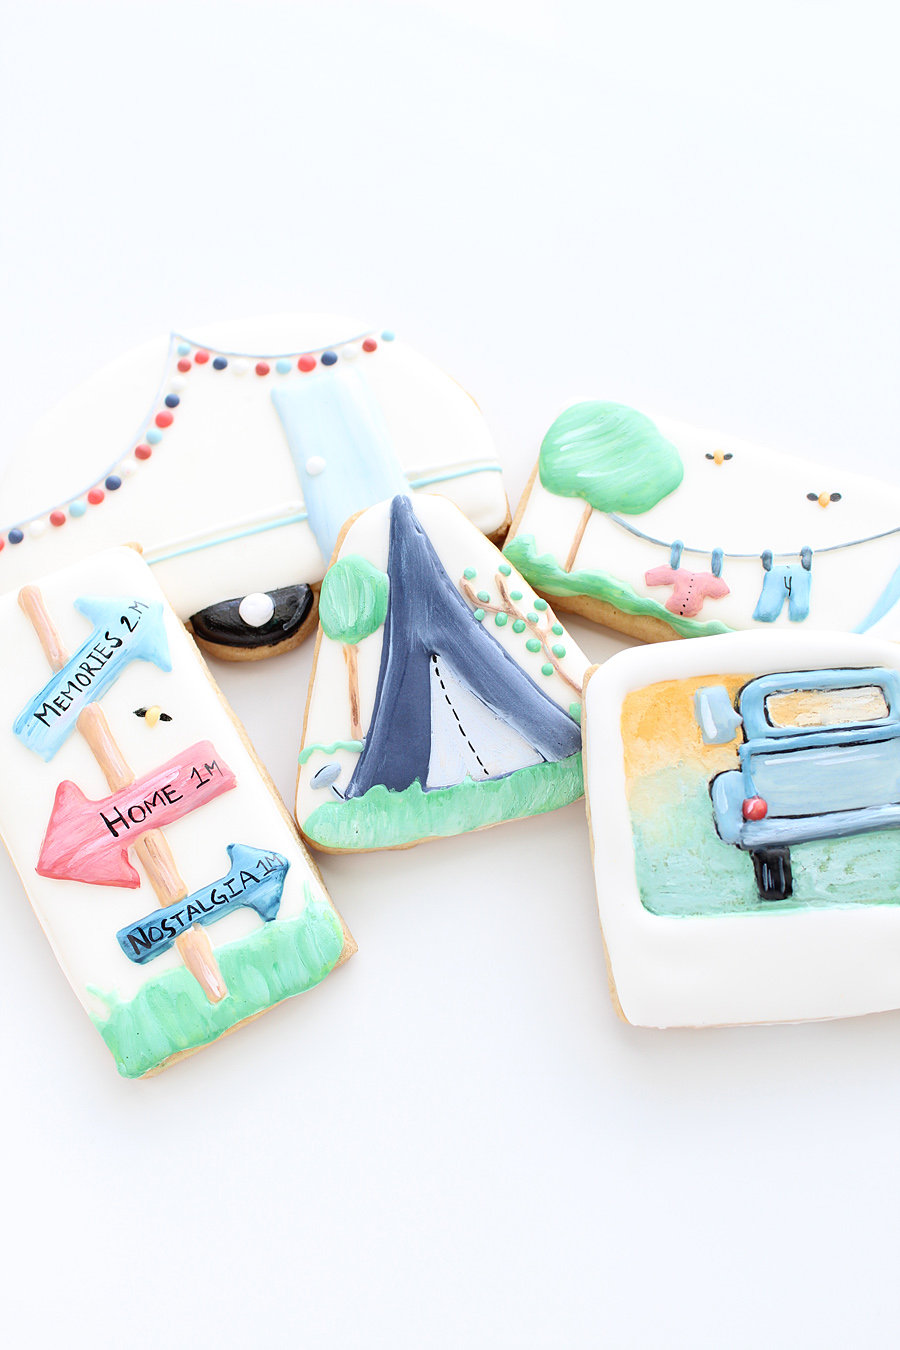 Commissioned Cookies Hand Painted & Layered | $200+/Dozen  1 Dozen Minimum